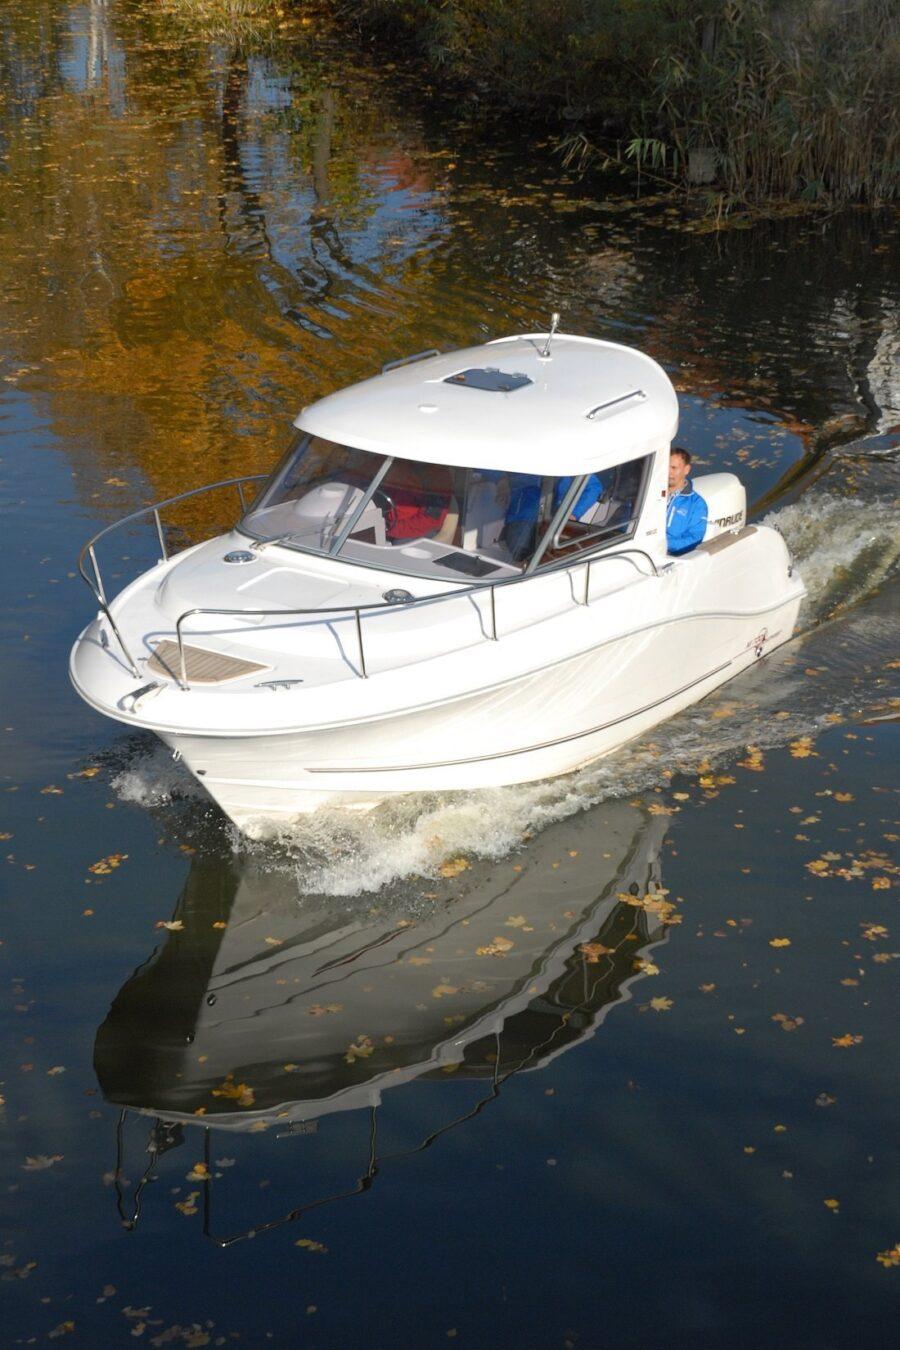 mazury 700 camping cruiser planing hull